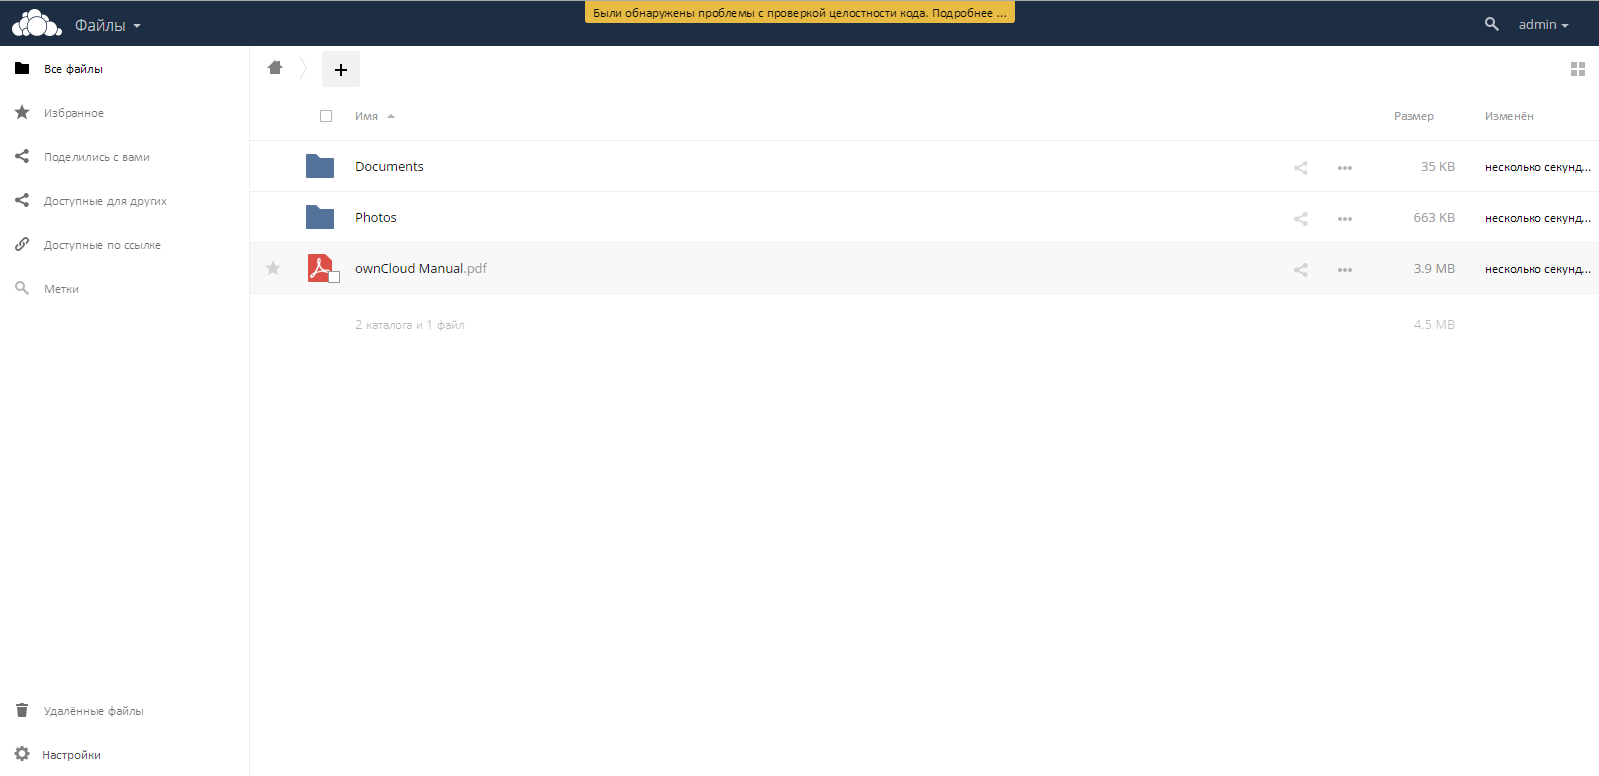 OwnCloud - главная страница